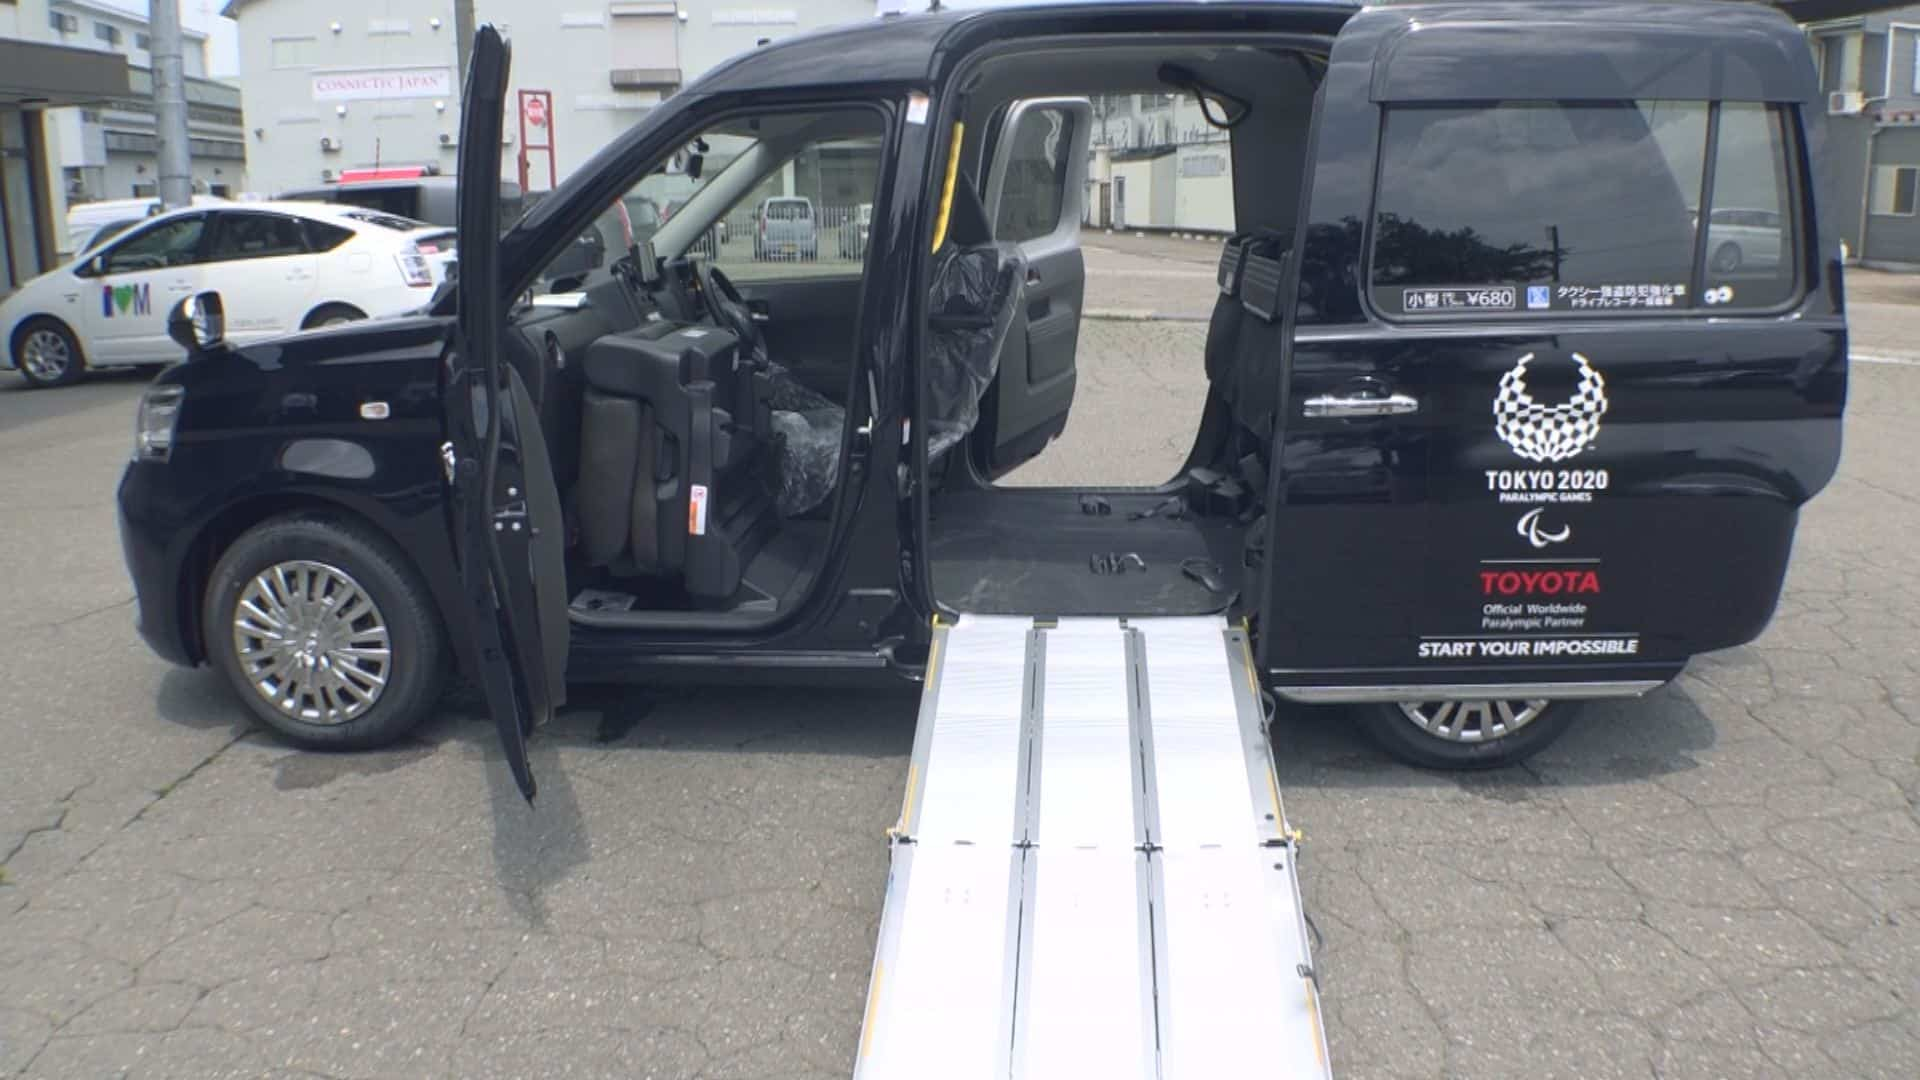 Toyota JPN Taxi Concept : ประตูเปิดปิดปกติ ถูกเปลี่ยนเป็นบานเลื่อนสไลด์